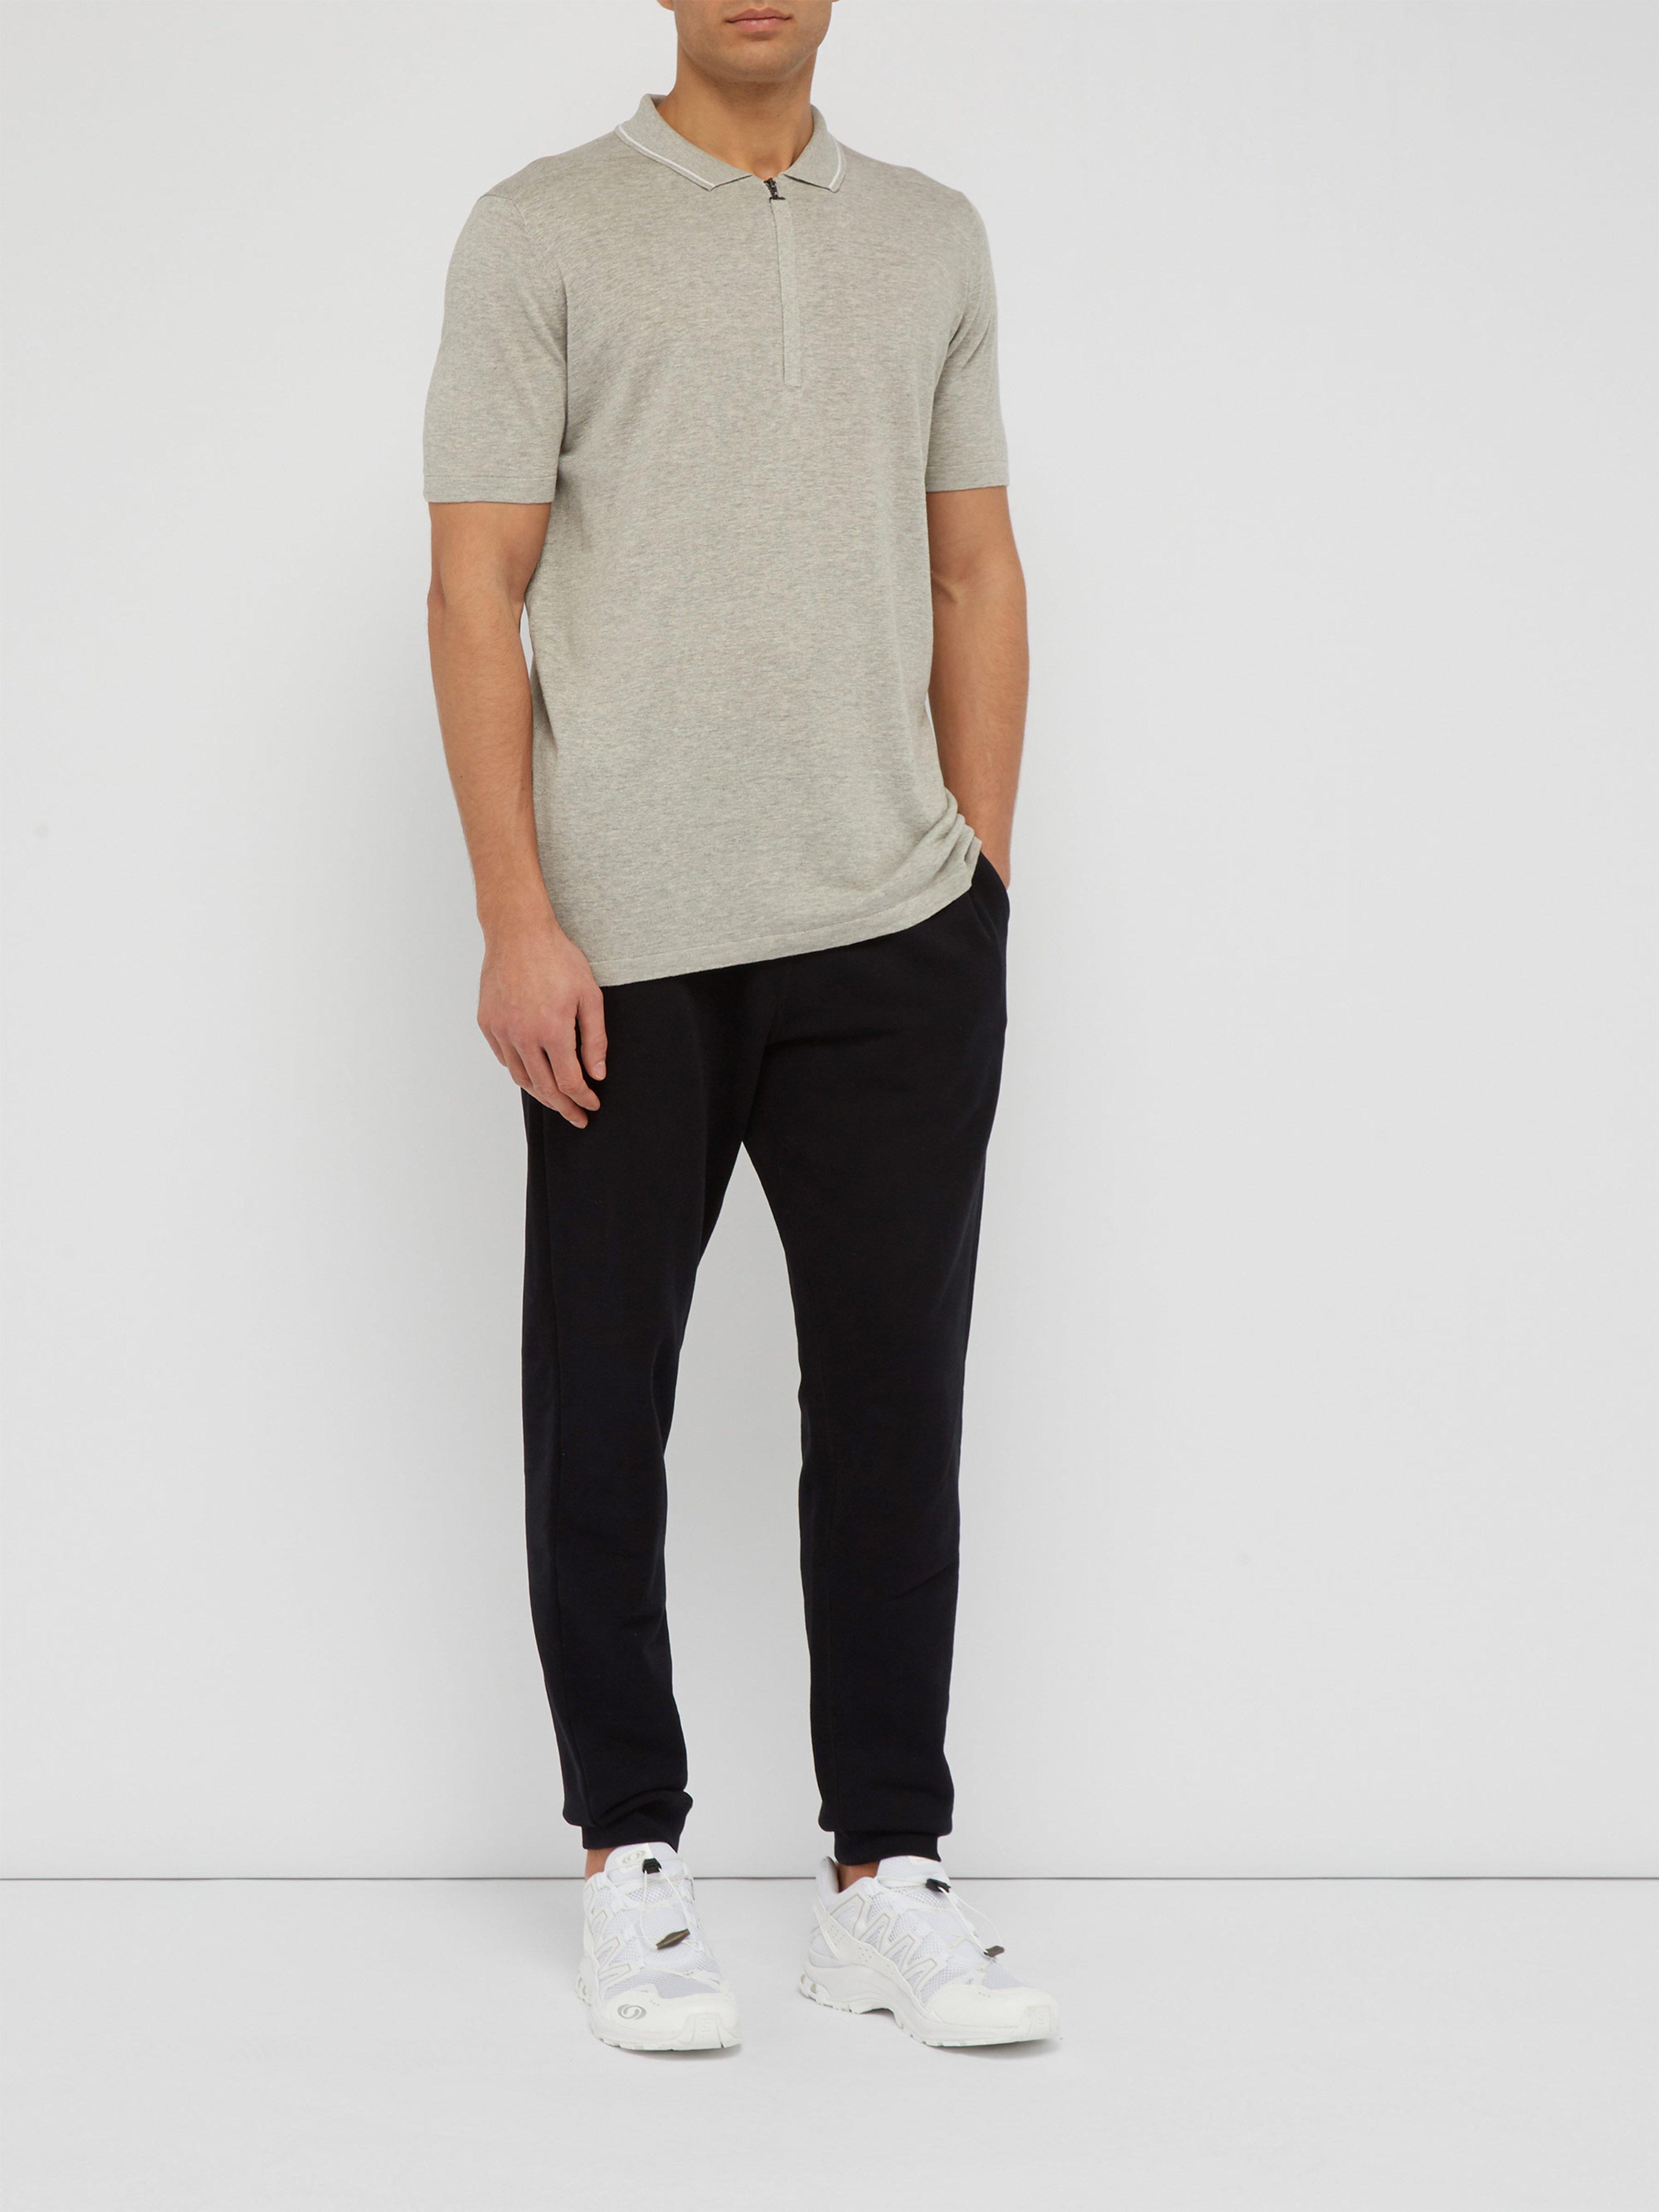 21f828da6 Falke Half Zip Silk Blend Polo Shirt in Gray for Men - Lyst